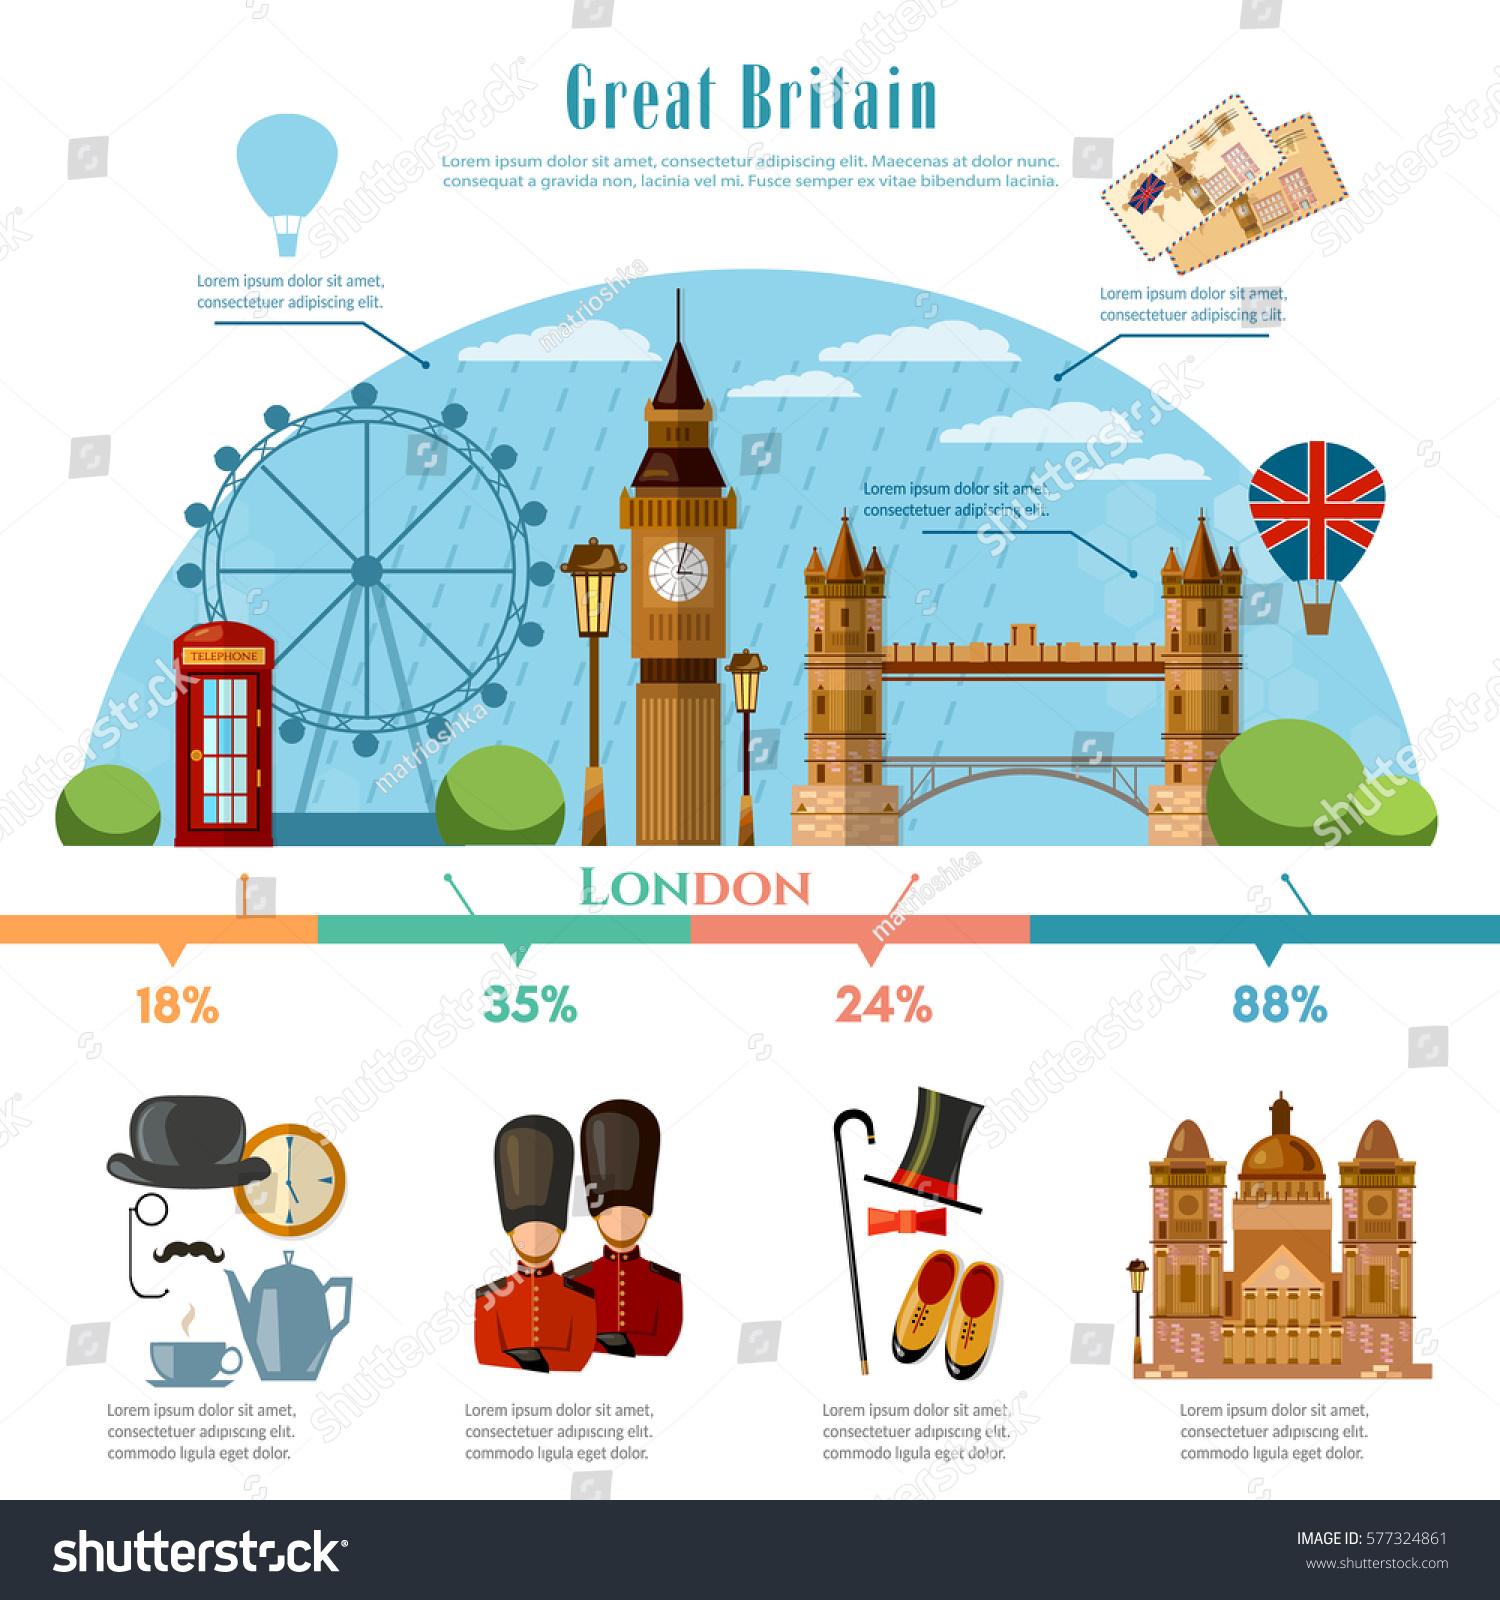 London Infographic Tourist Sights Great Britain Stock-Vektorgrafik ...